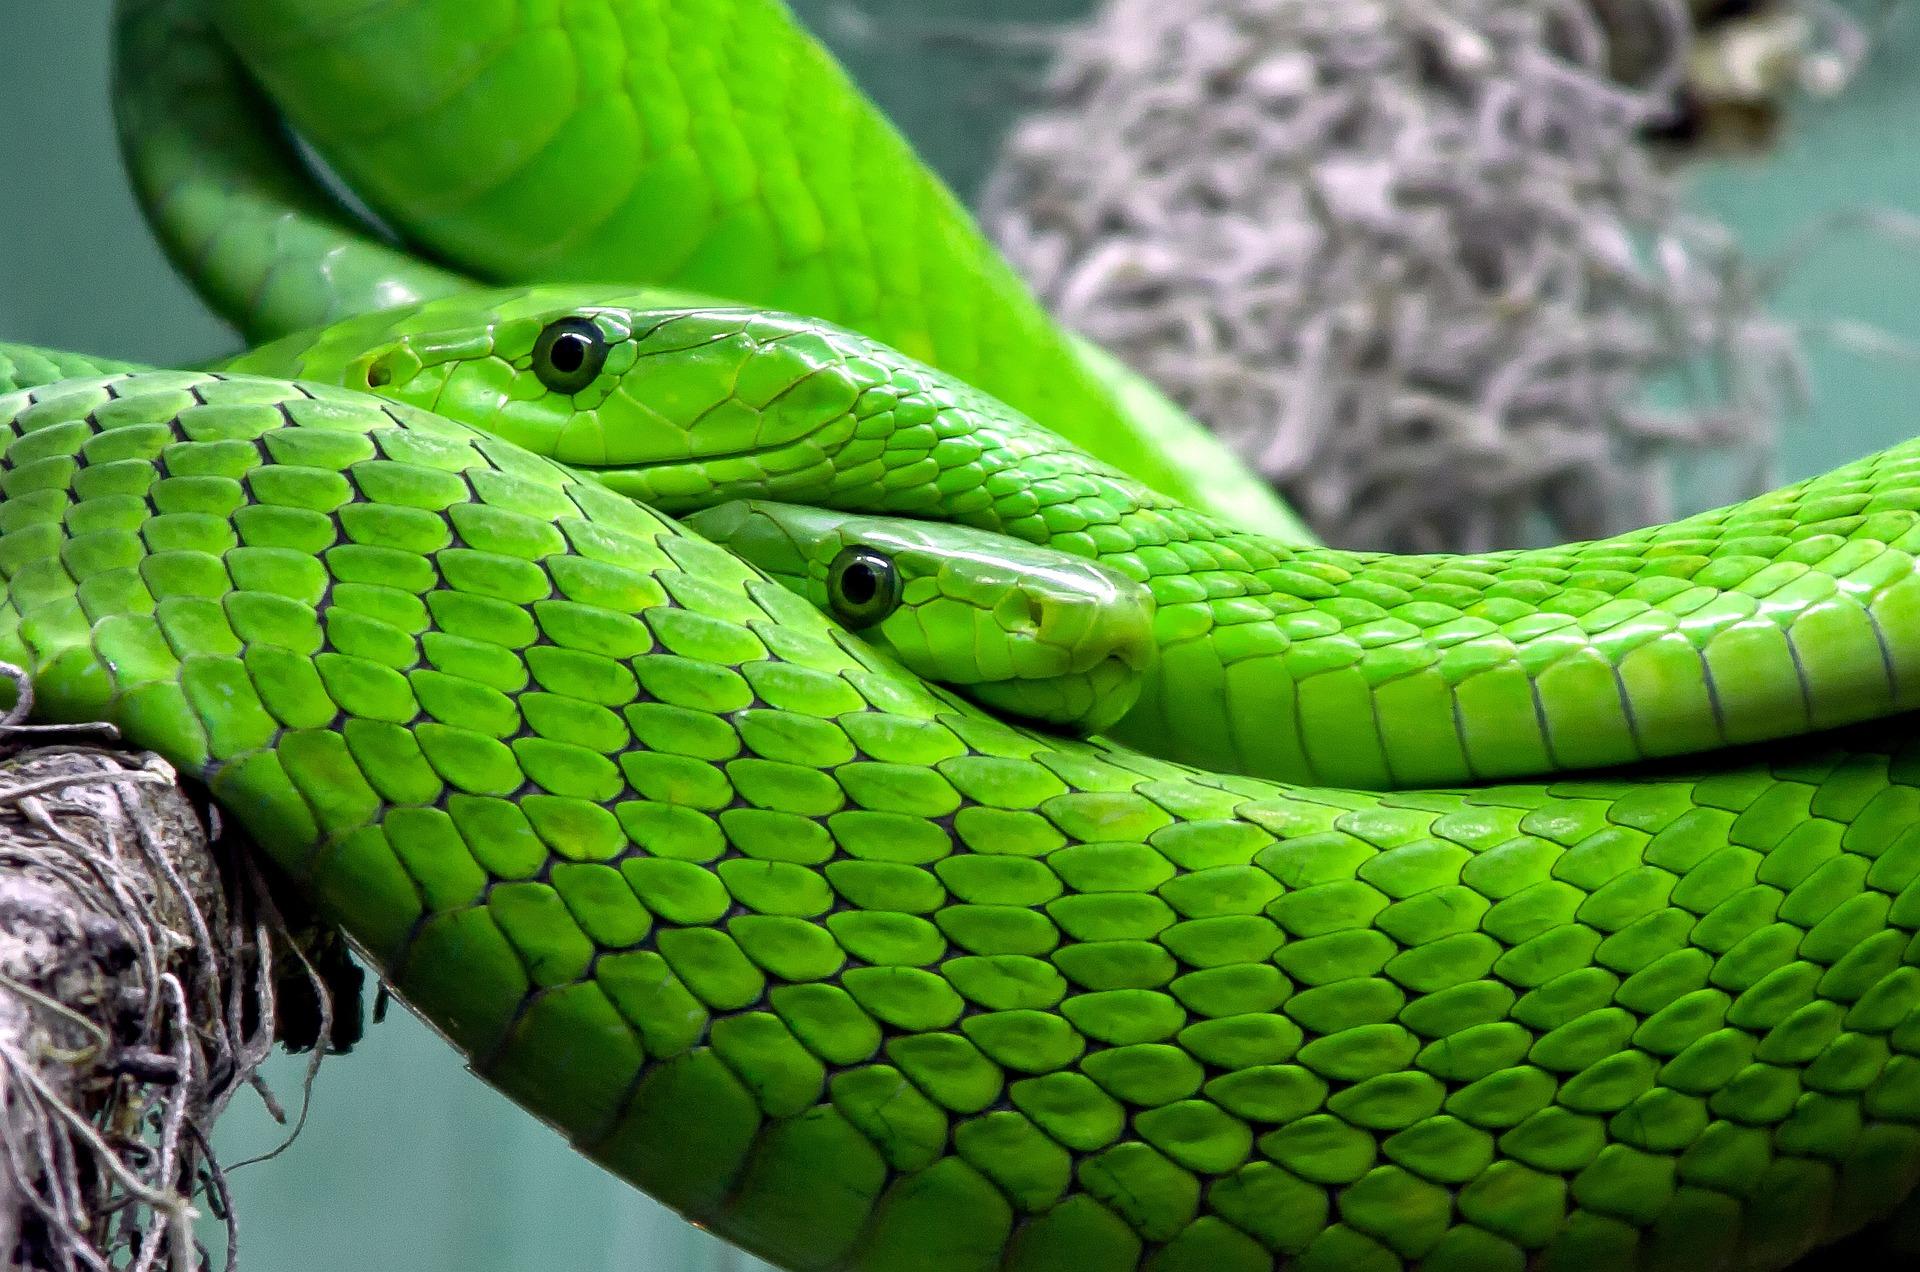 download wallpaper: twee groene pythons wallpaper